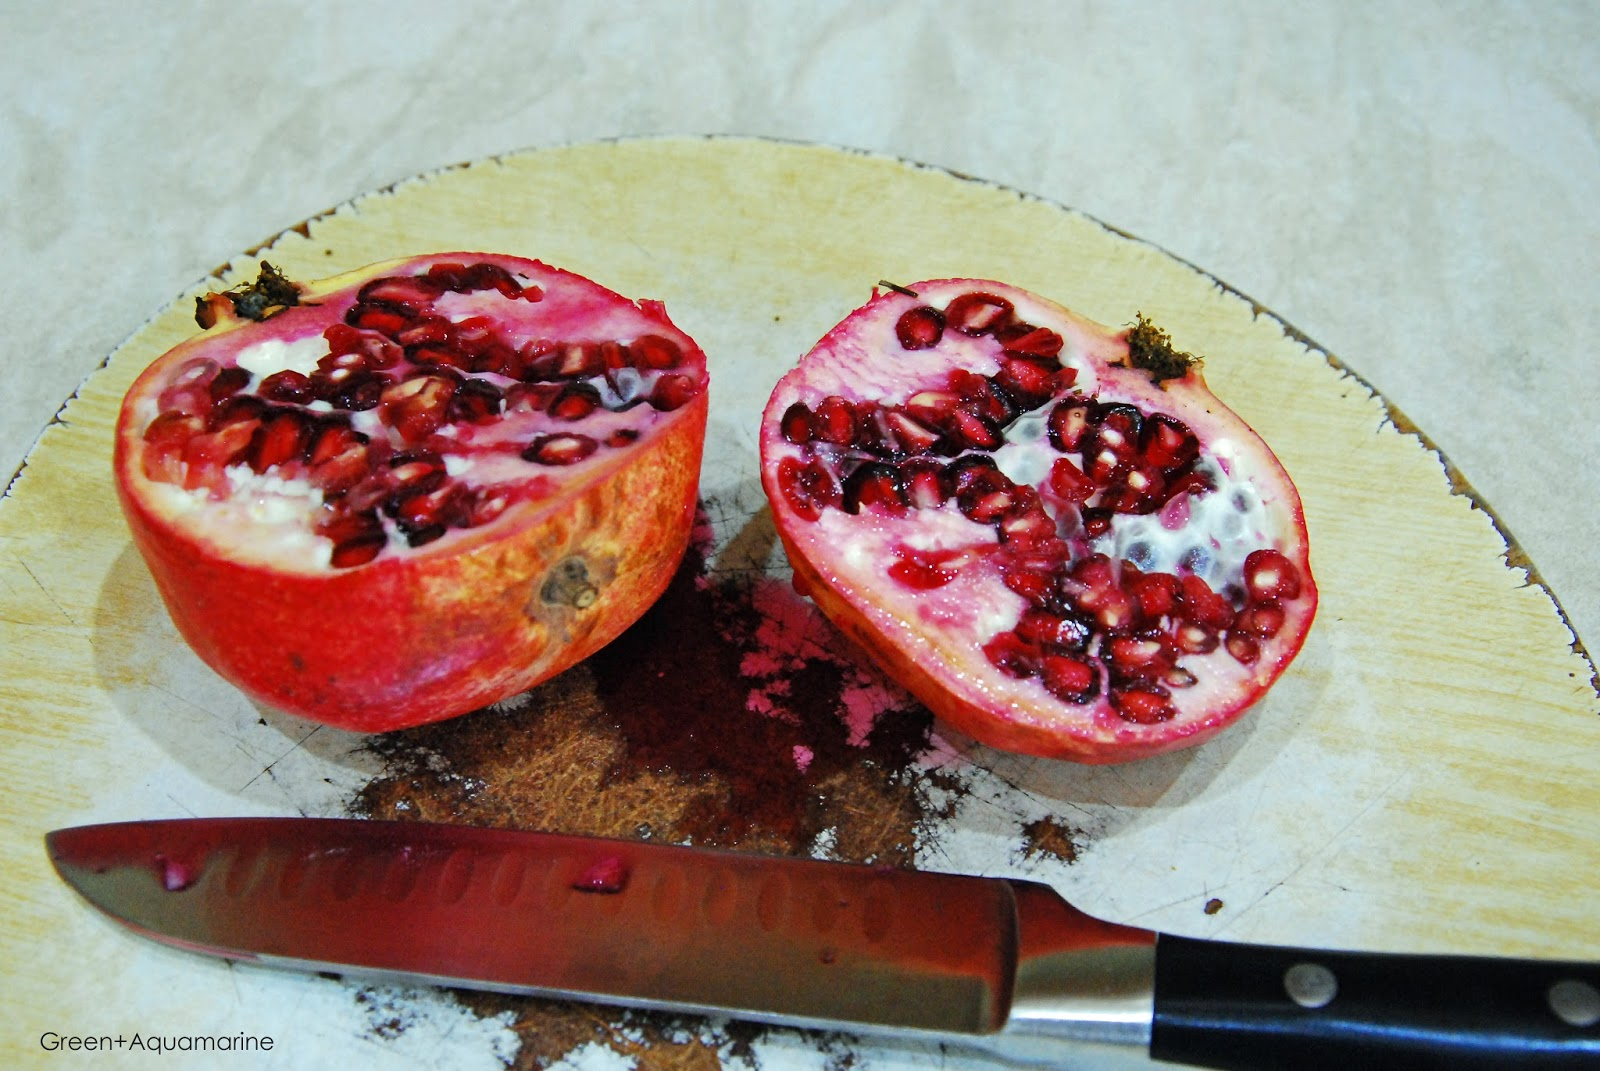 Superfood, quinoa, kale, pomegranate, salad